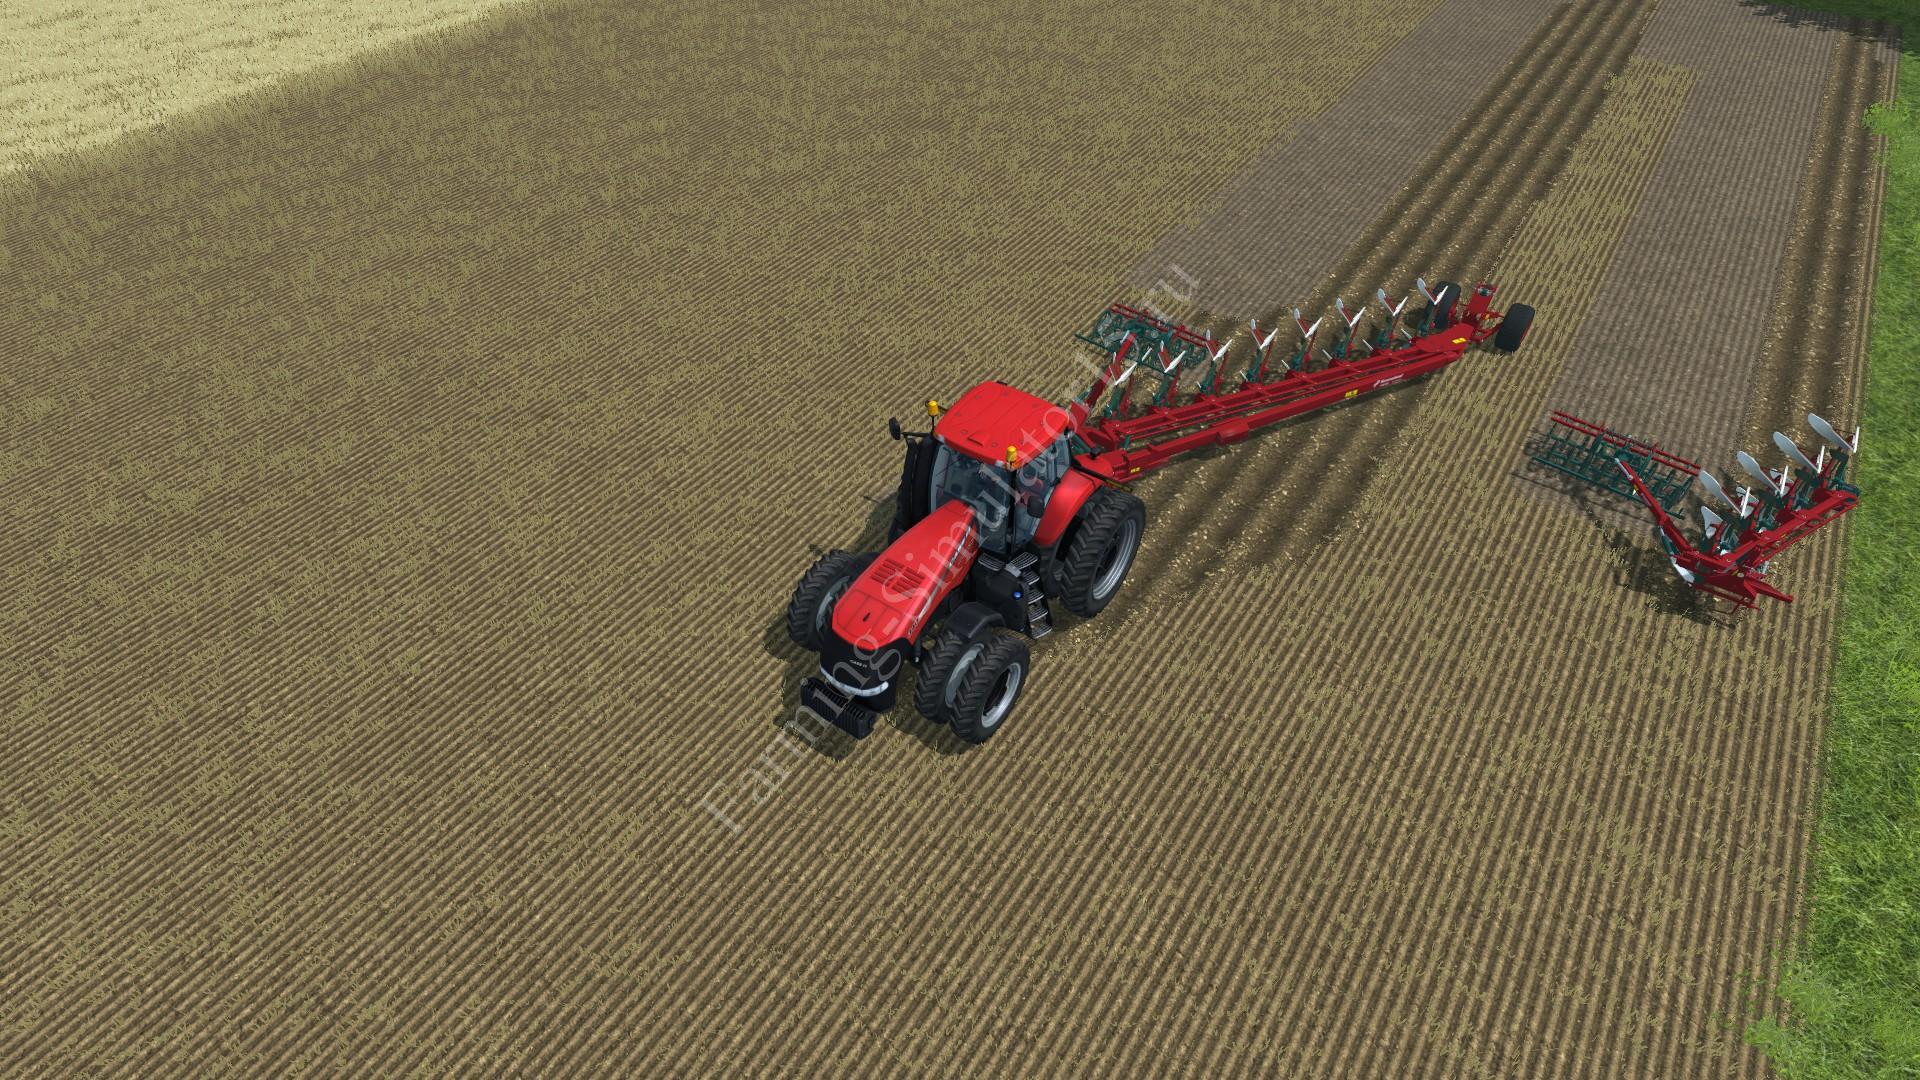 Мод плуга KVERNELAND PLOW PACK PW RW PACKOMAT V5.99 BETA Farming Simulator 2013, Farming Simulator 13